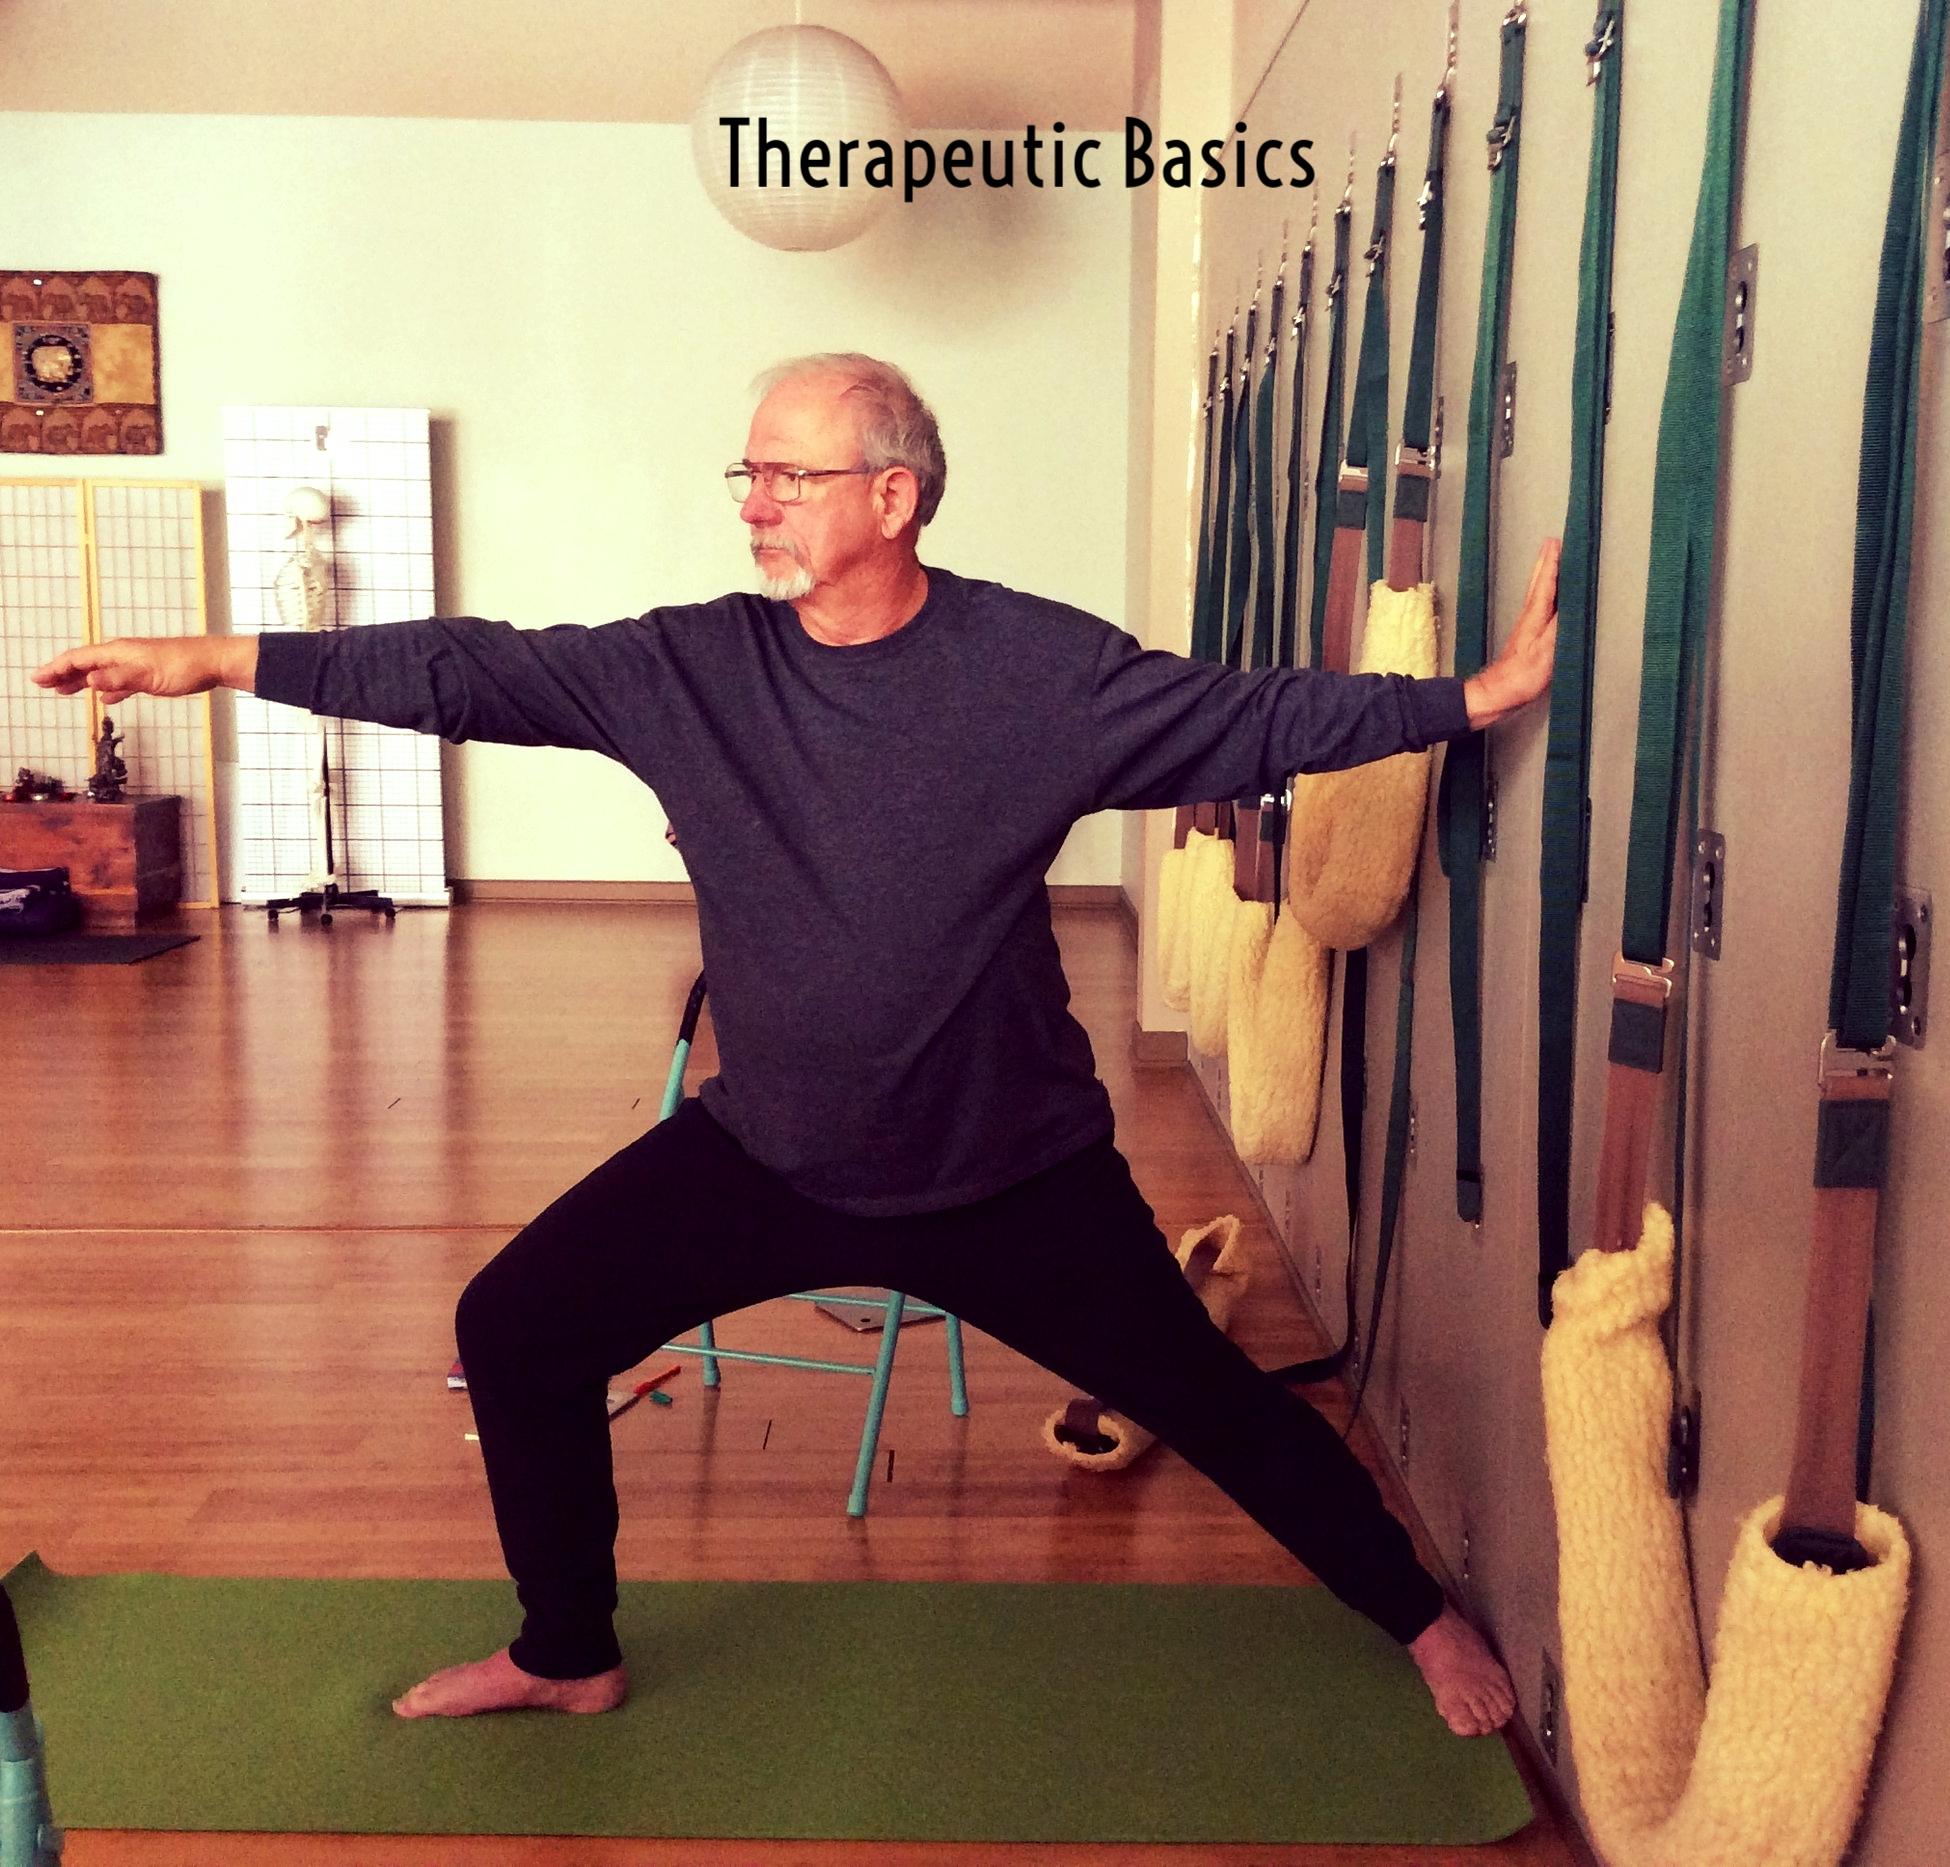 Therapeutic Basic Yoga